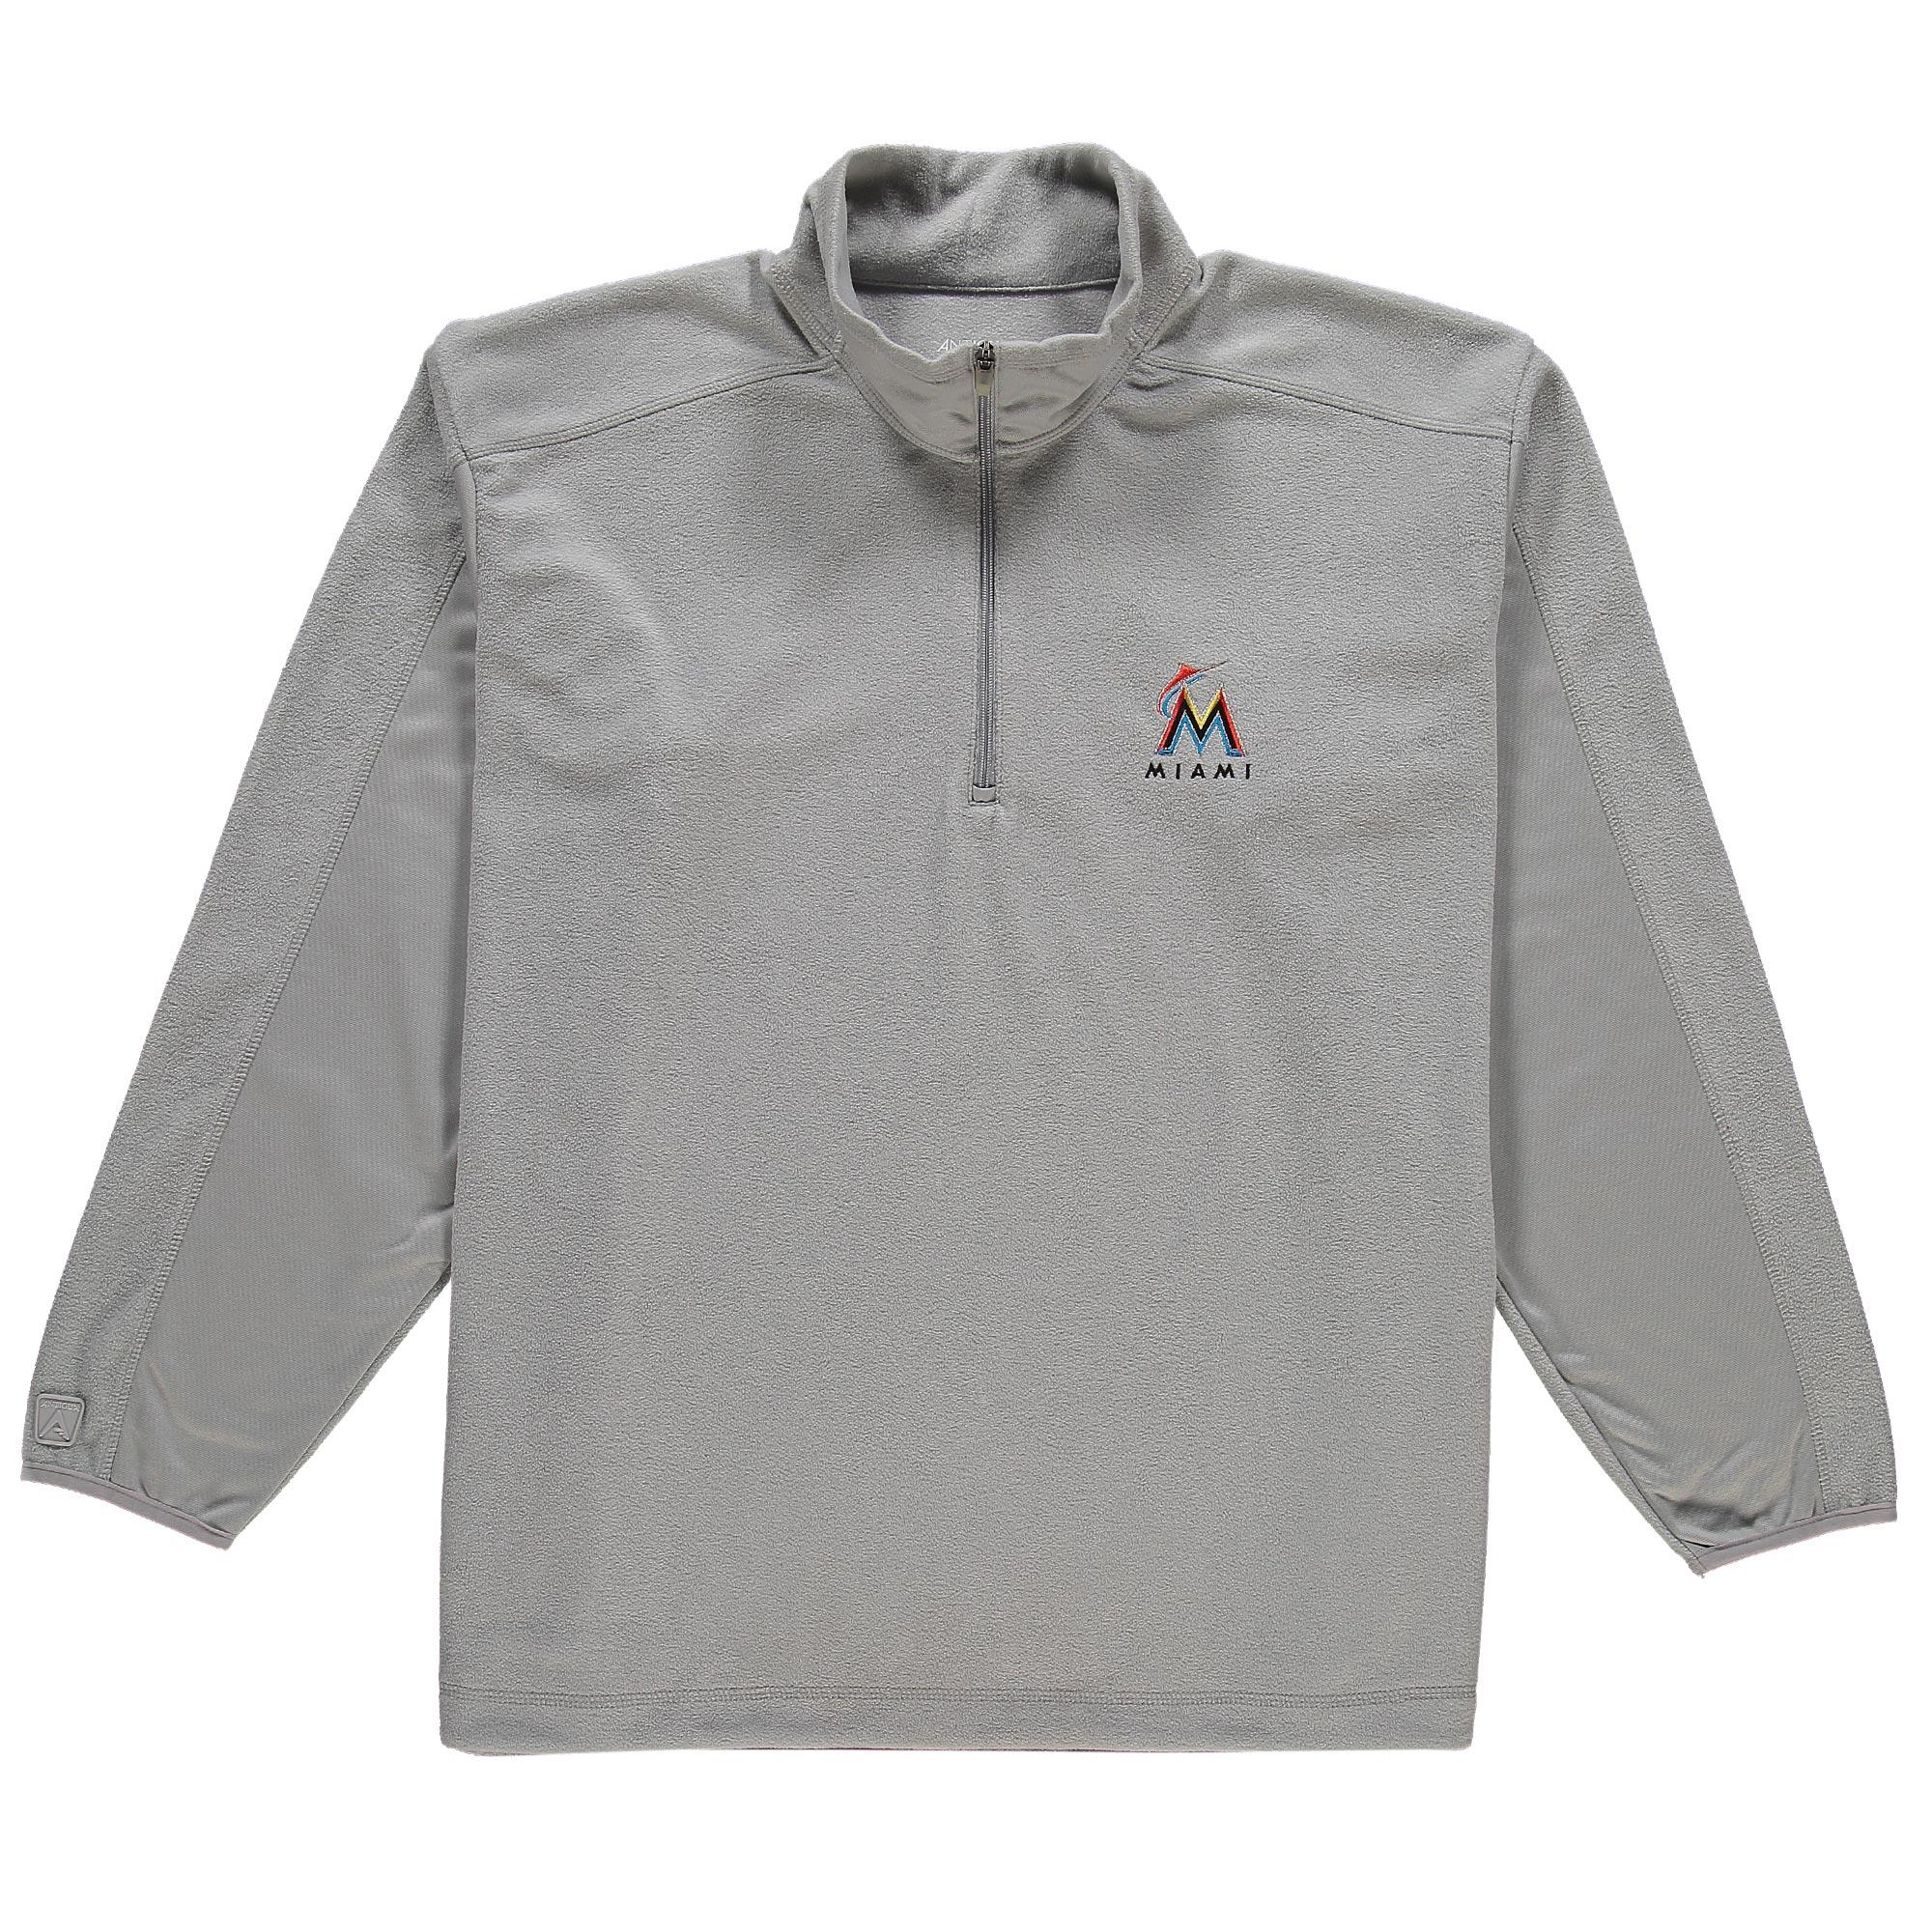 Miami Marlins Antigua Frost Micro Fleece Quarter-Zip Jacket - Silver